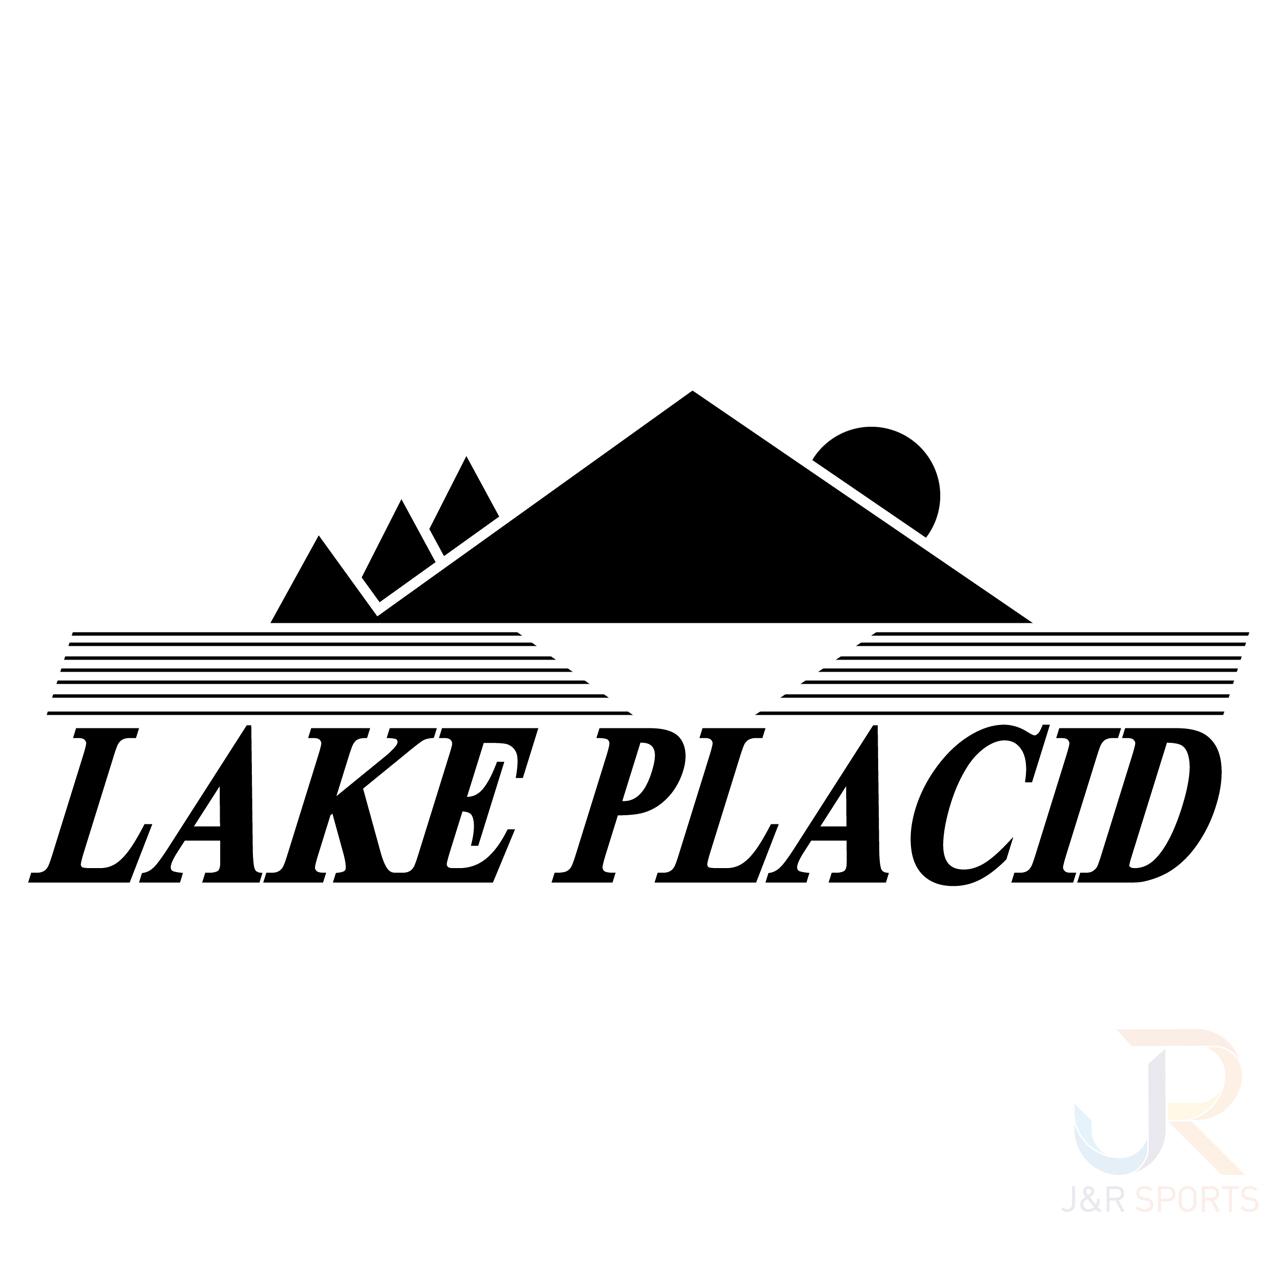 Lake Placid Ice Skates